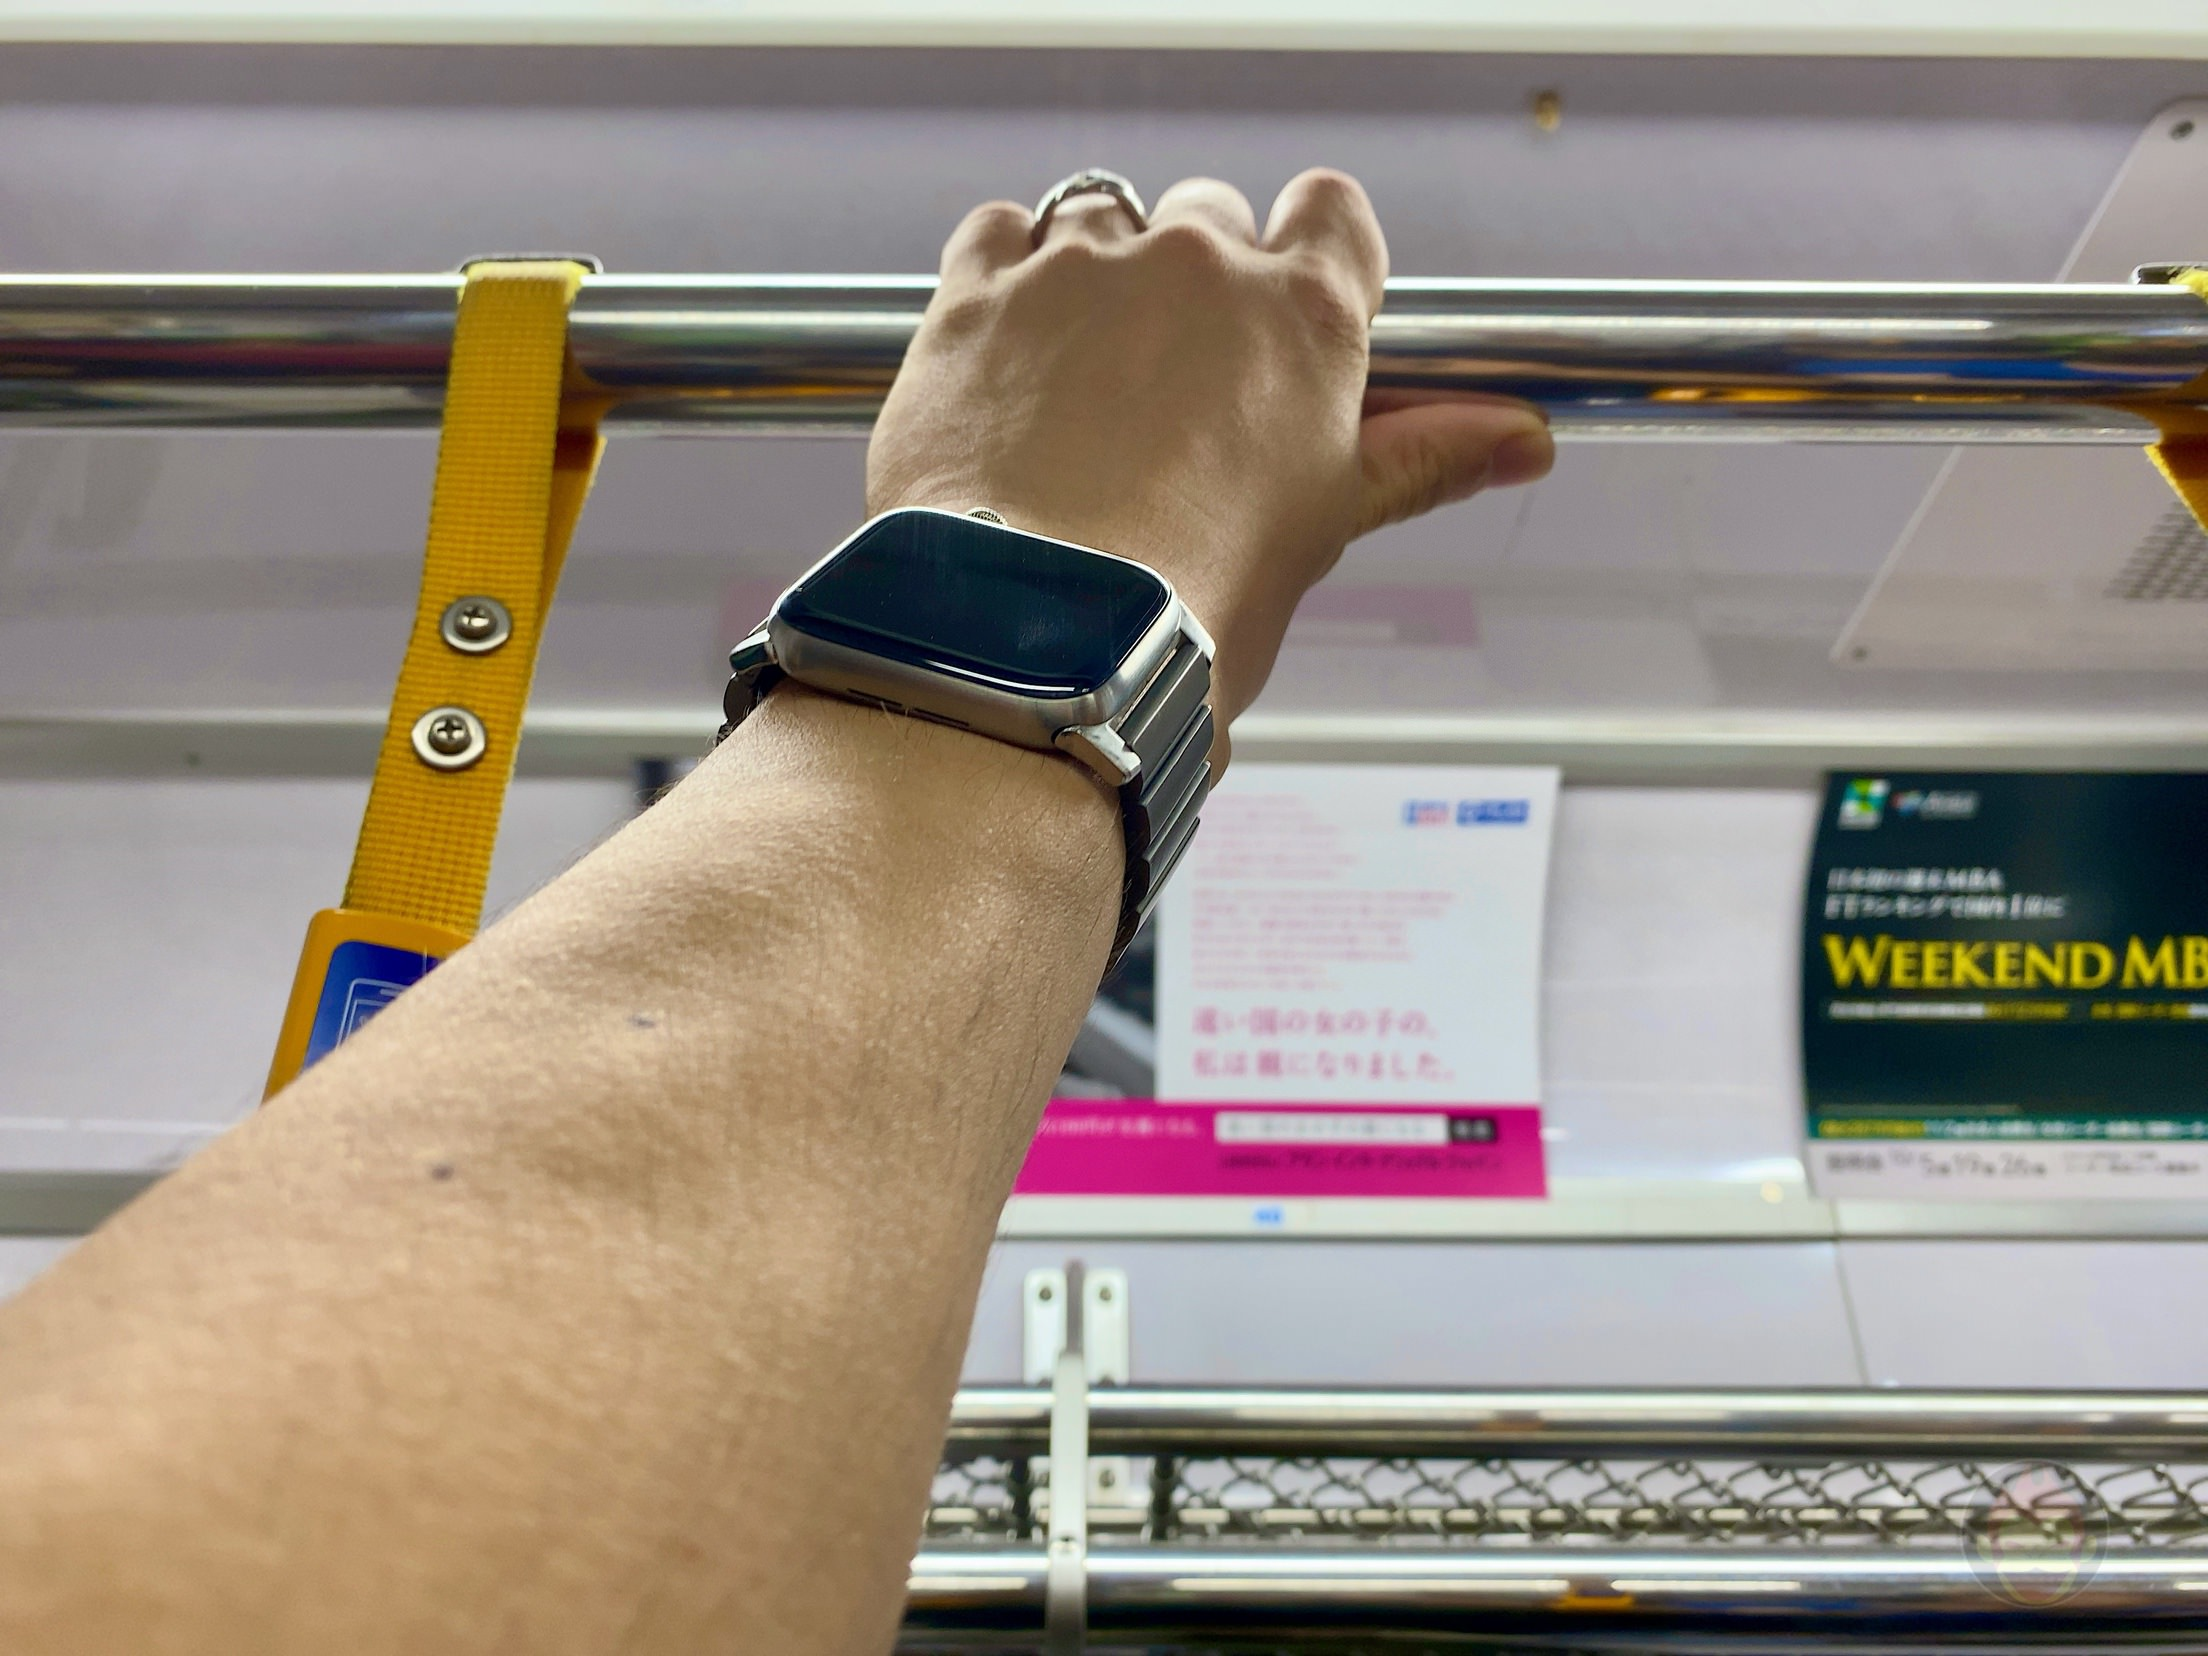 Apple-Watch-Series-5-Review-10.jpeg